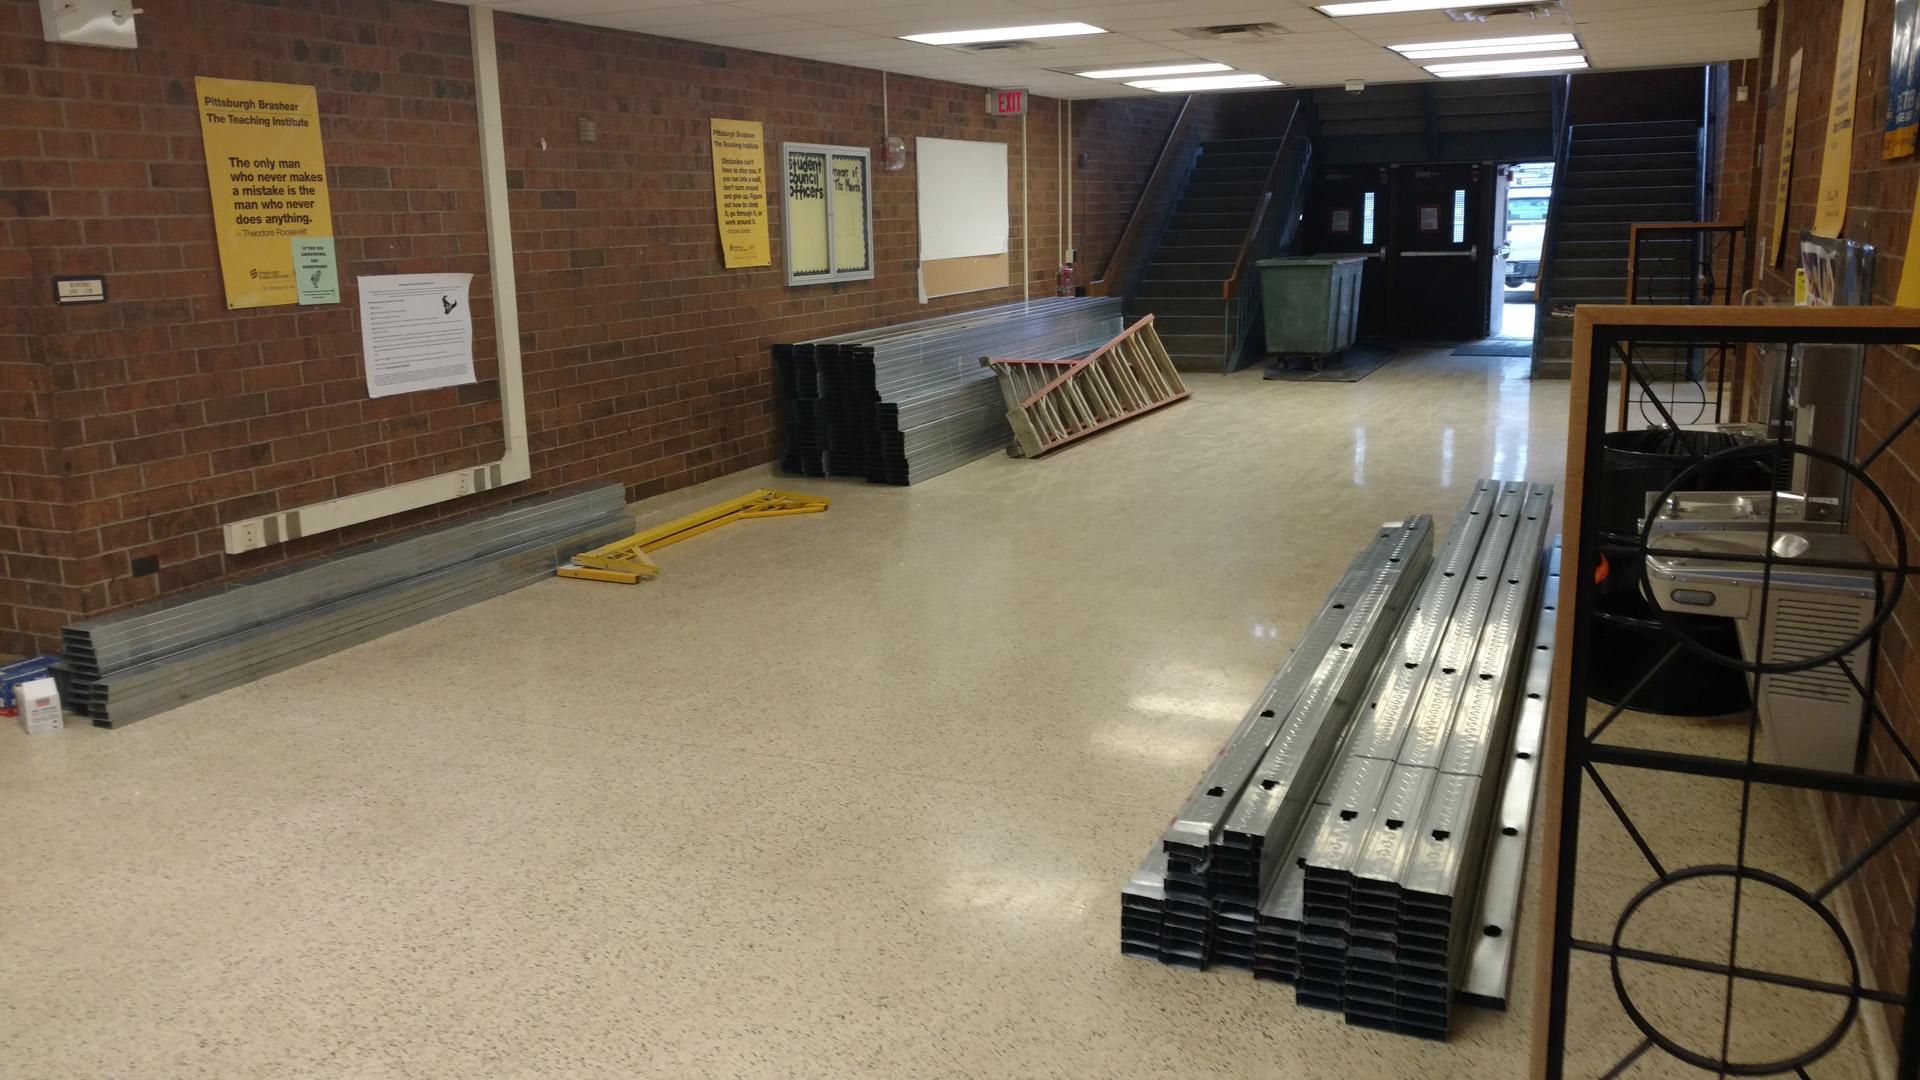 Pittsburgh Public Schools - Image 1